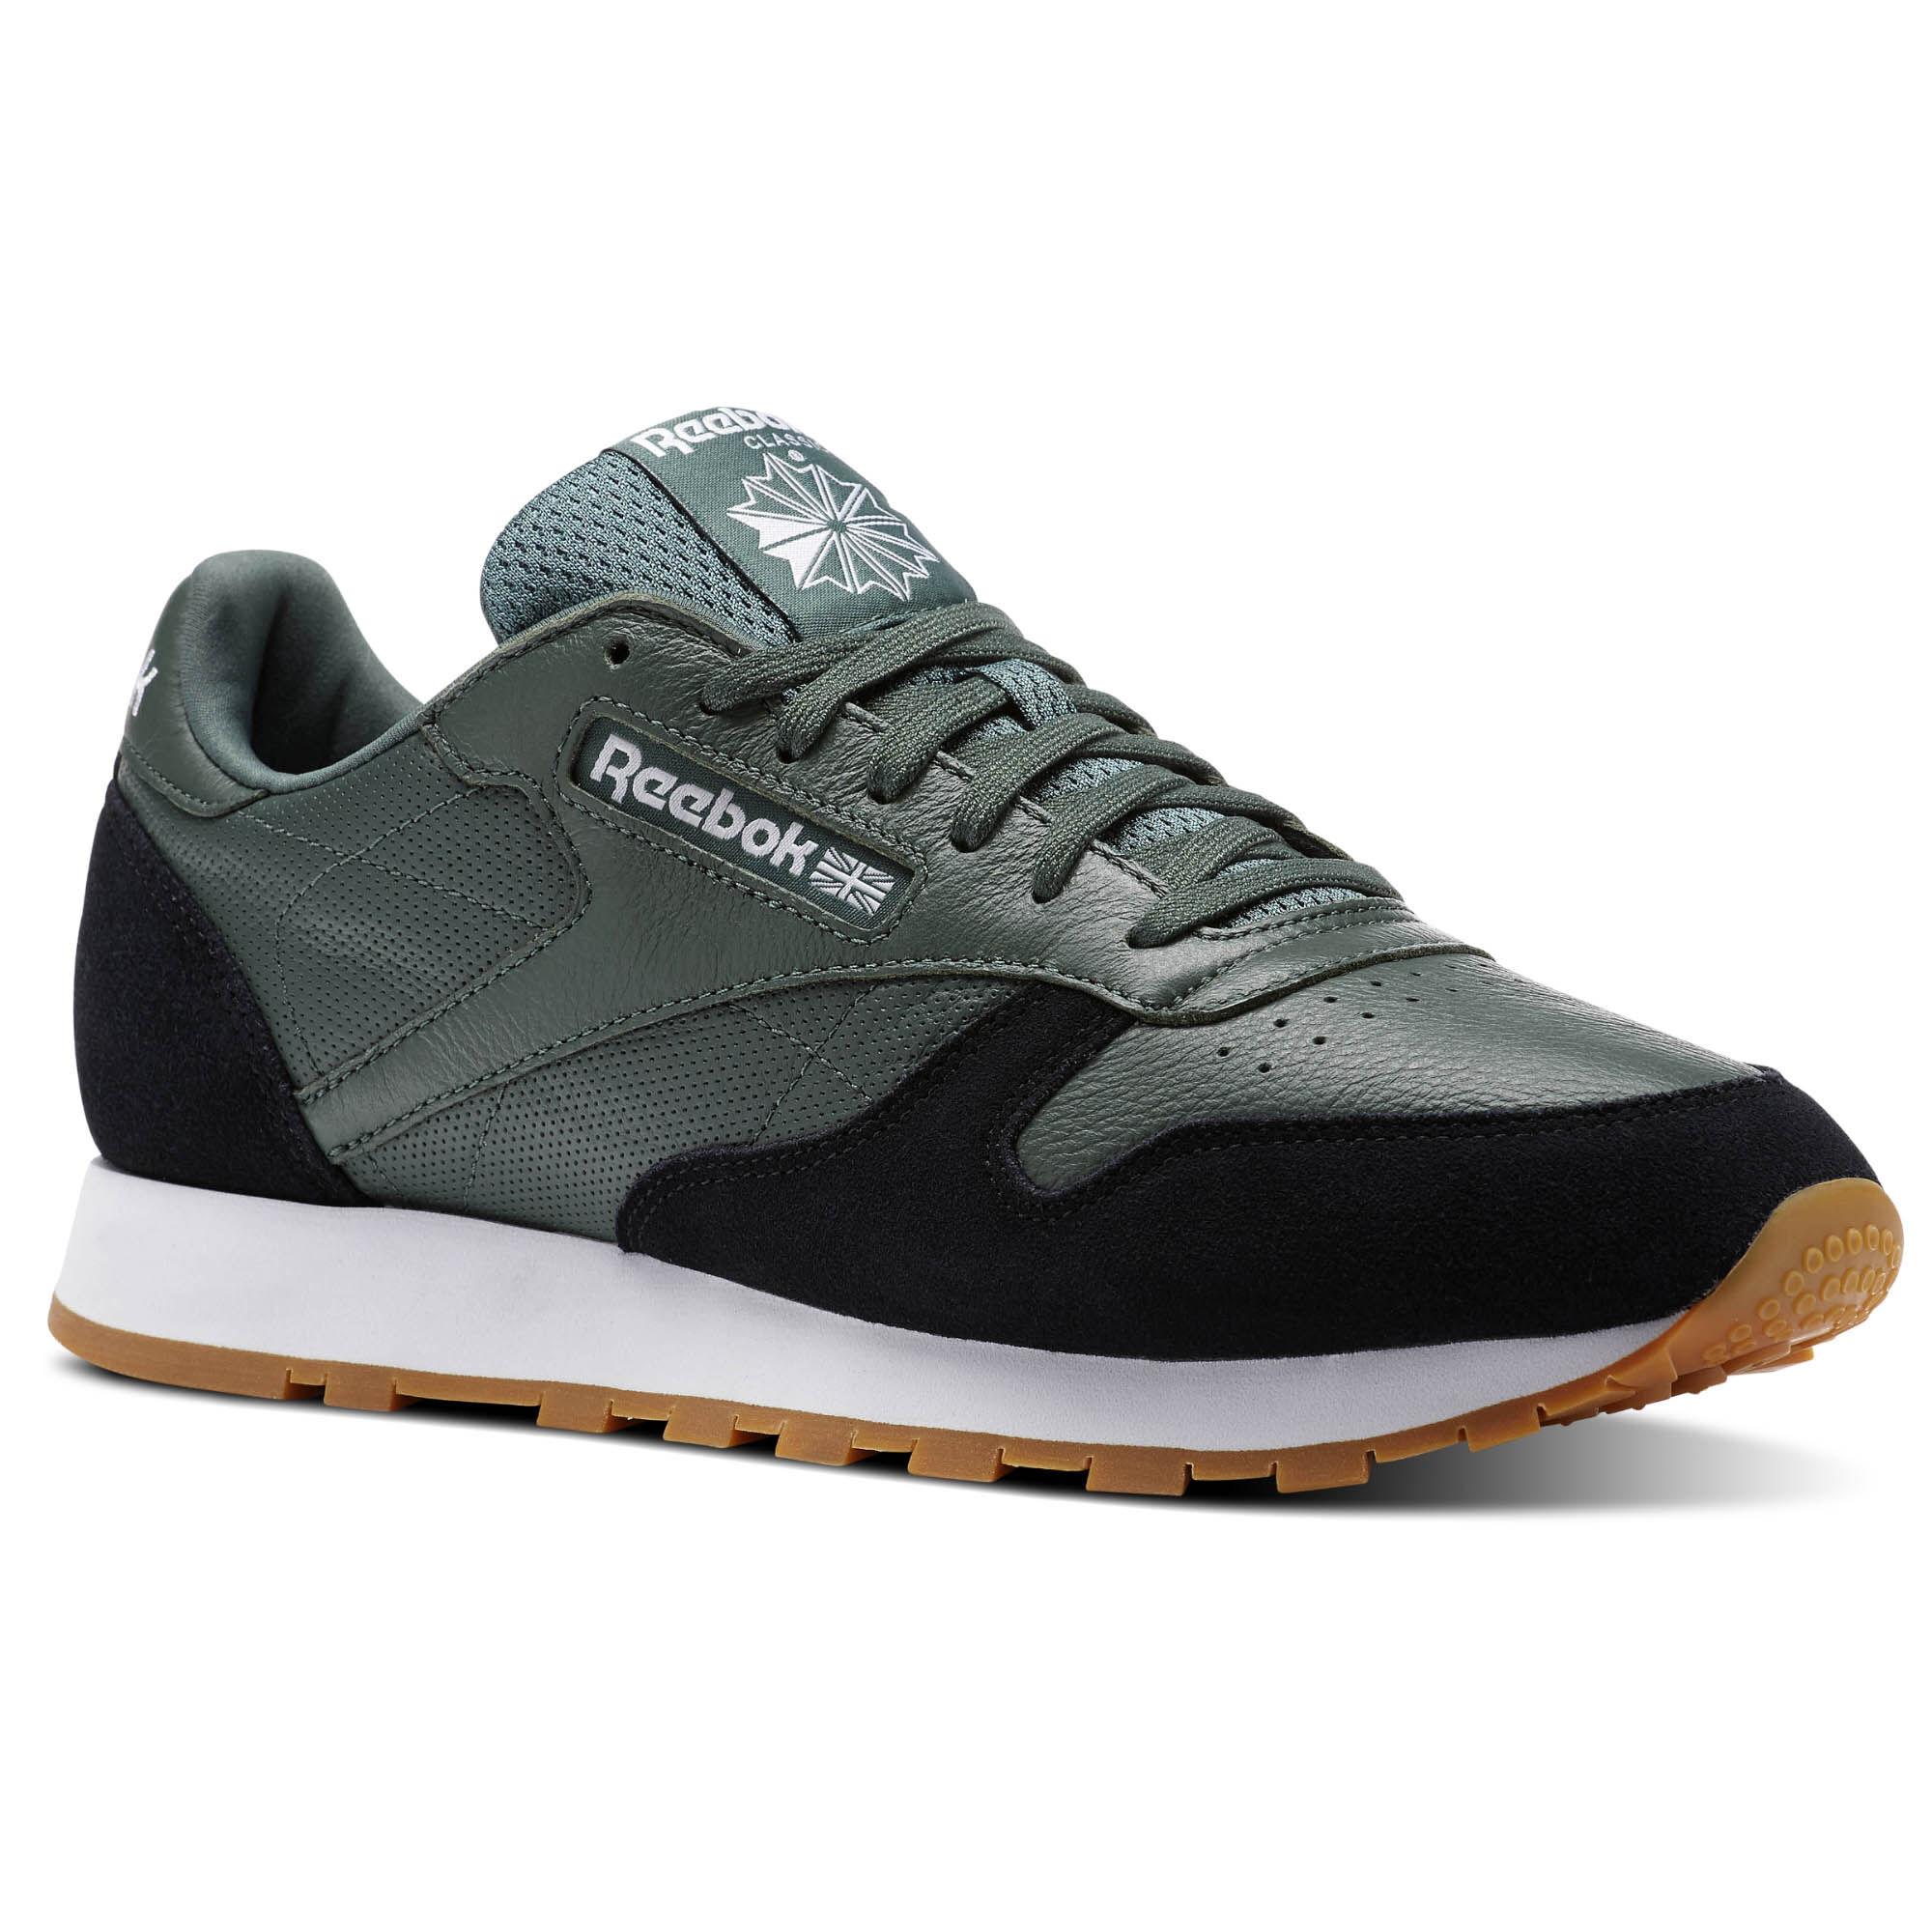 CLASSIC LEATHER RIPPLE SM - Sneaker low - collegiate navy/acid blue/chalk JlwvXWN9BI